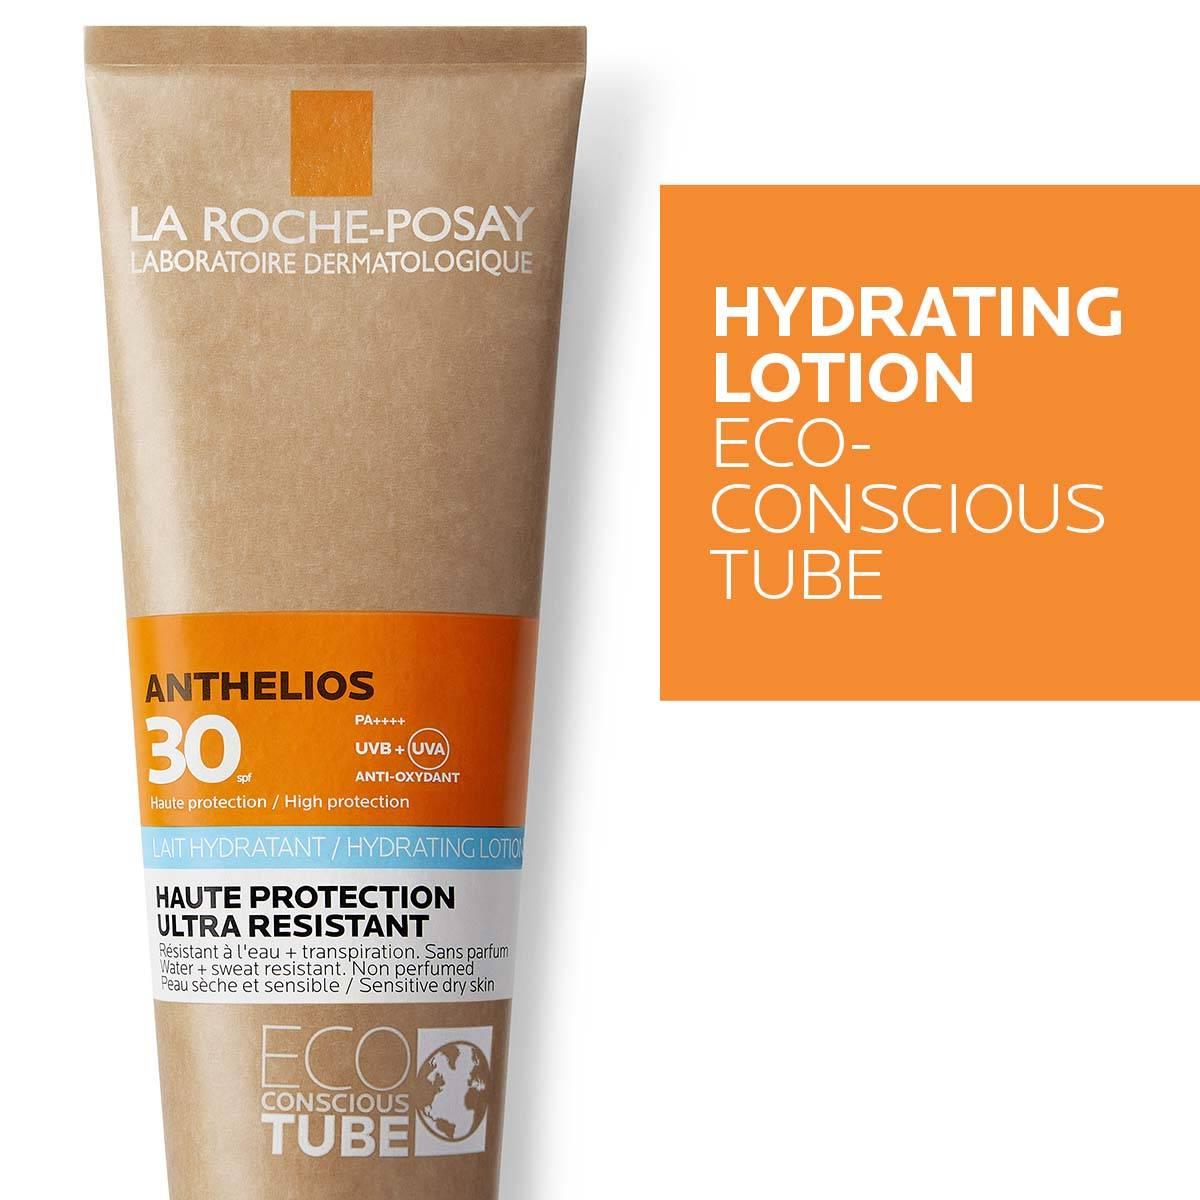 LaRochePosay-Product-Sun-Anthelios-HydratingLotionSpf30-250ml-EcoConscious-3337875761116_flS